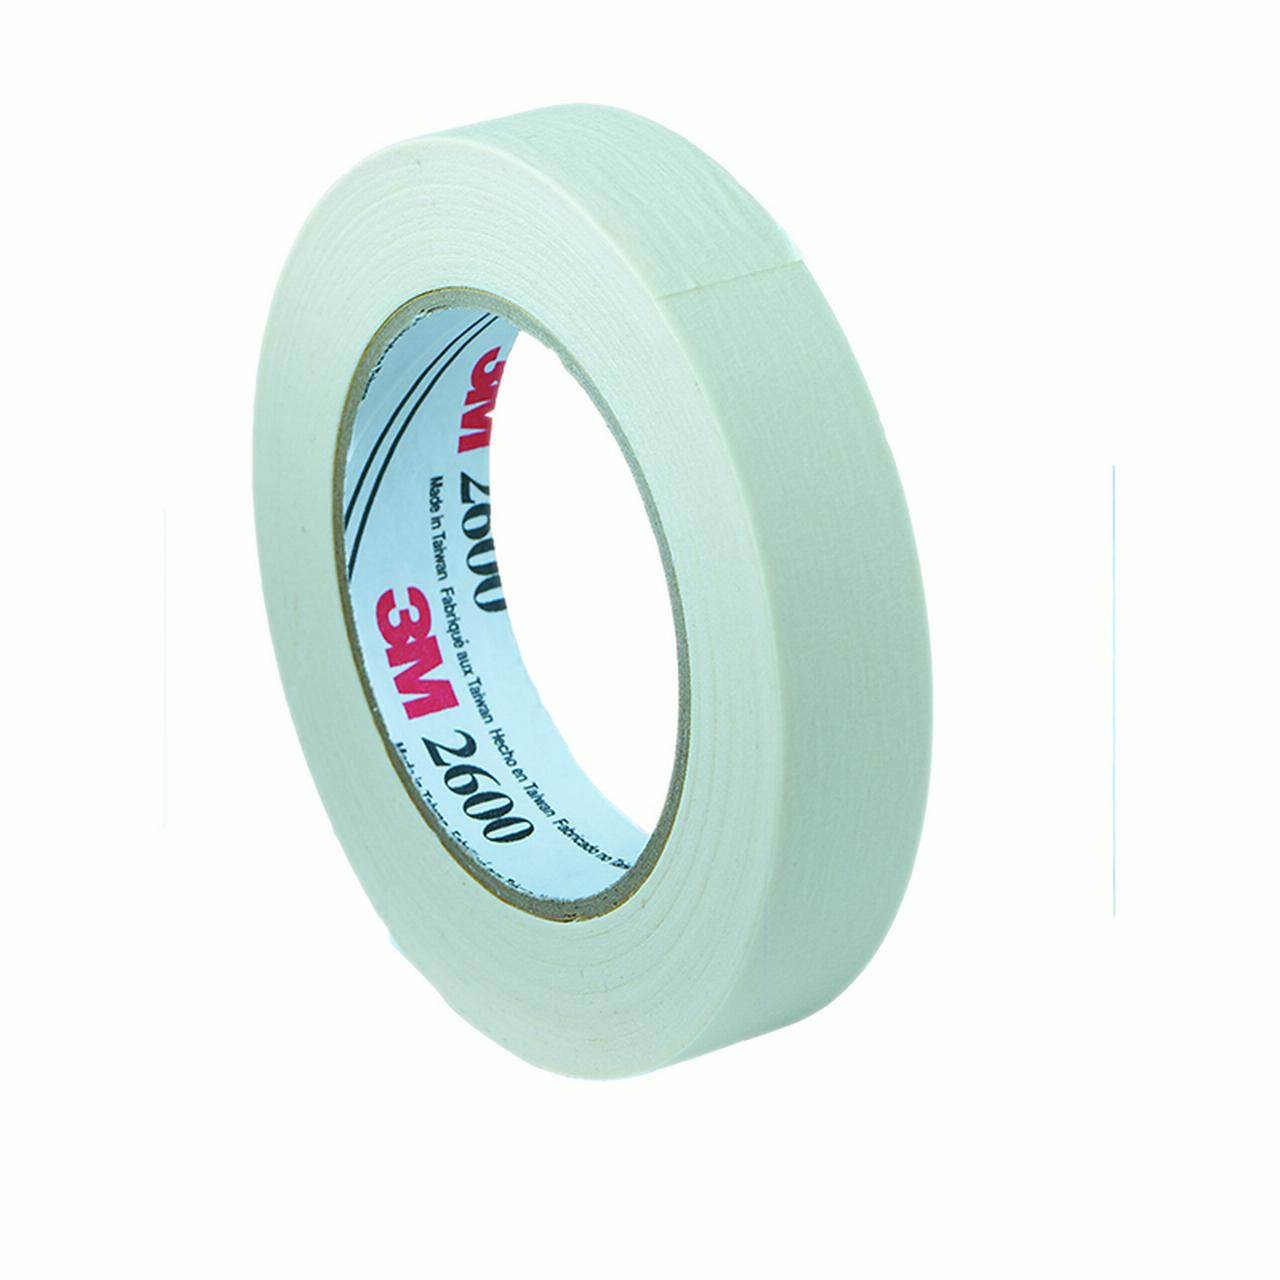 3M Masking Tape 2In X 60Yds - image 1 de 1